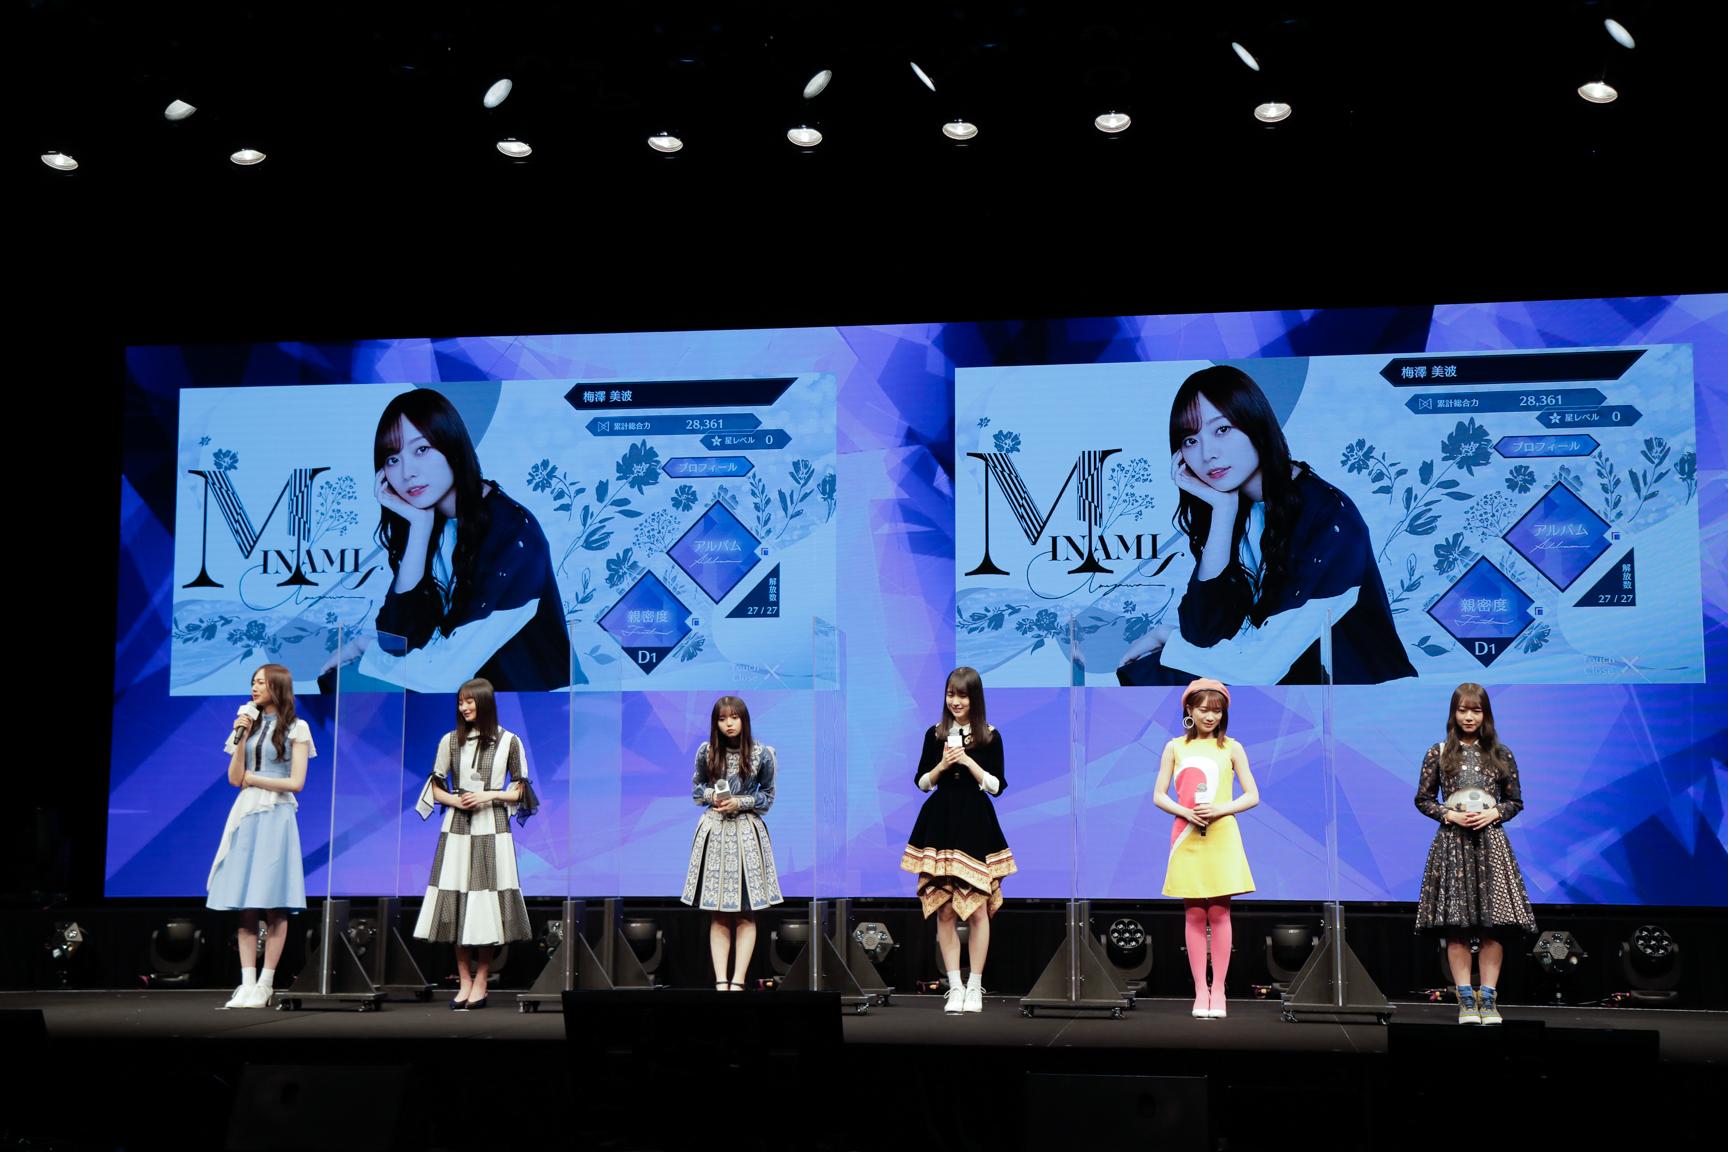 乃木坂46「乃木坂的フラクタル」新CM発表会